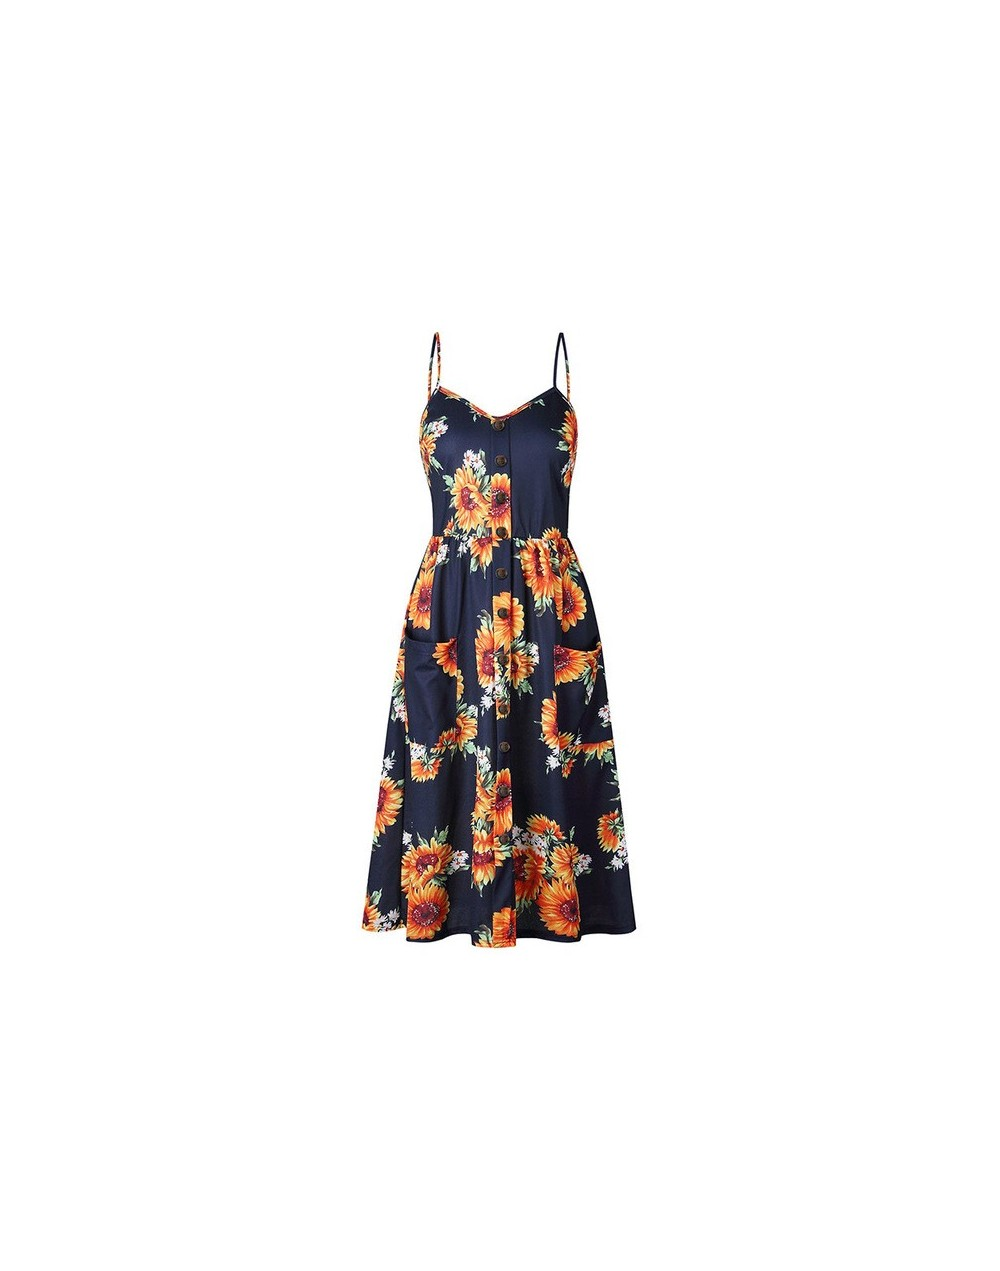 Summer Dress Vestido Vintage Sarafan Bohemian Women Sexy Floral Tunic Beach Maxi Party Dress Summer Robe Pocket Dress Plue S...